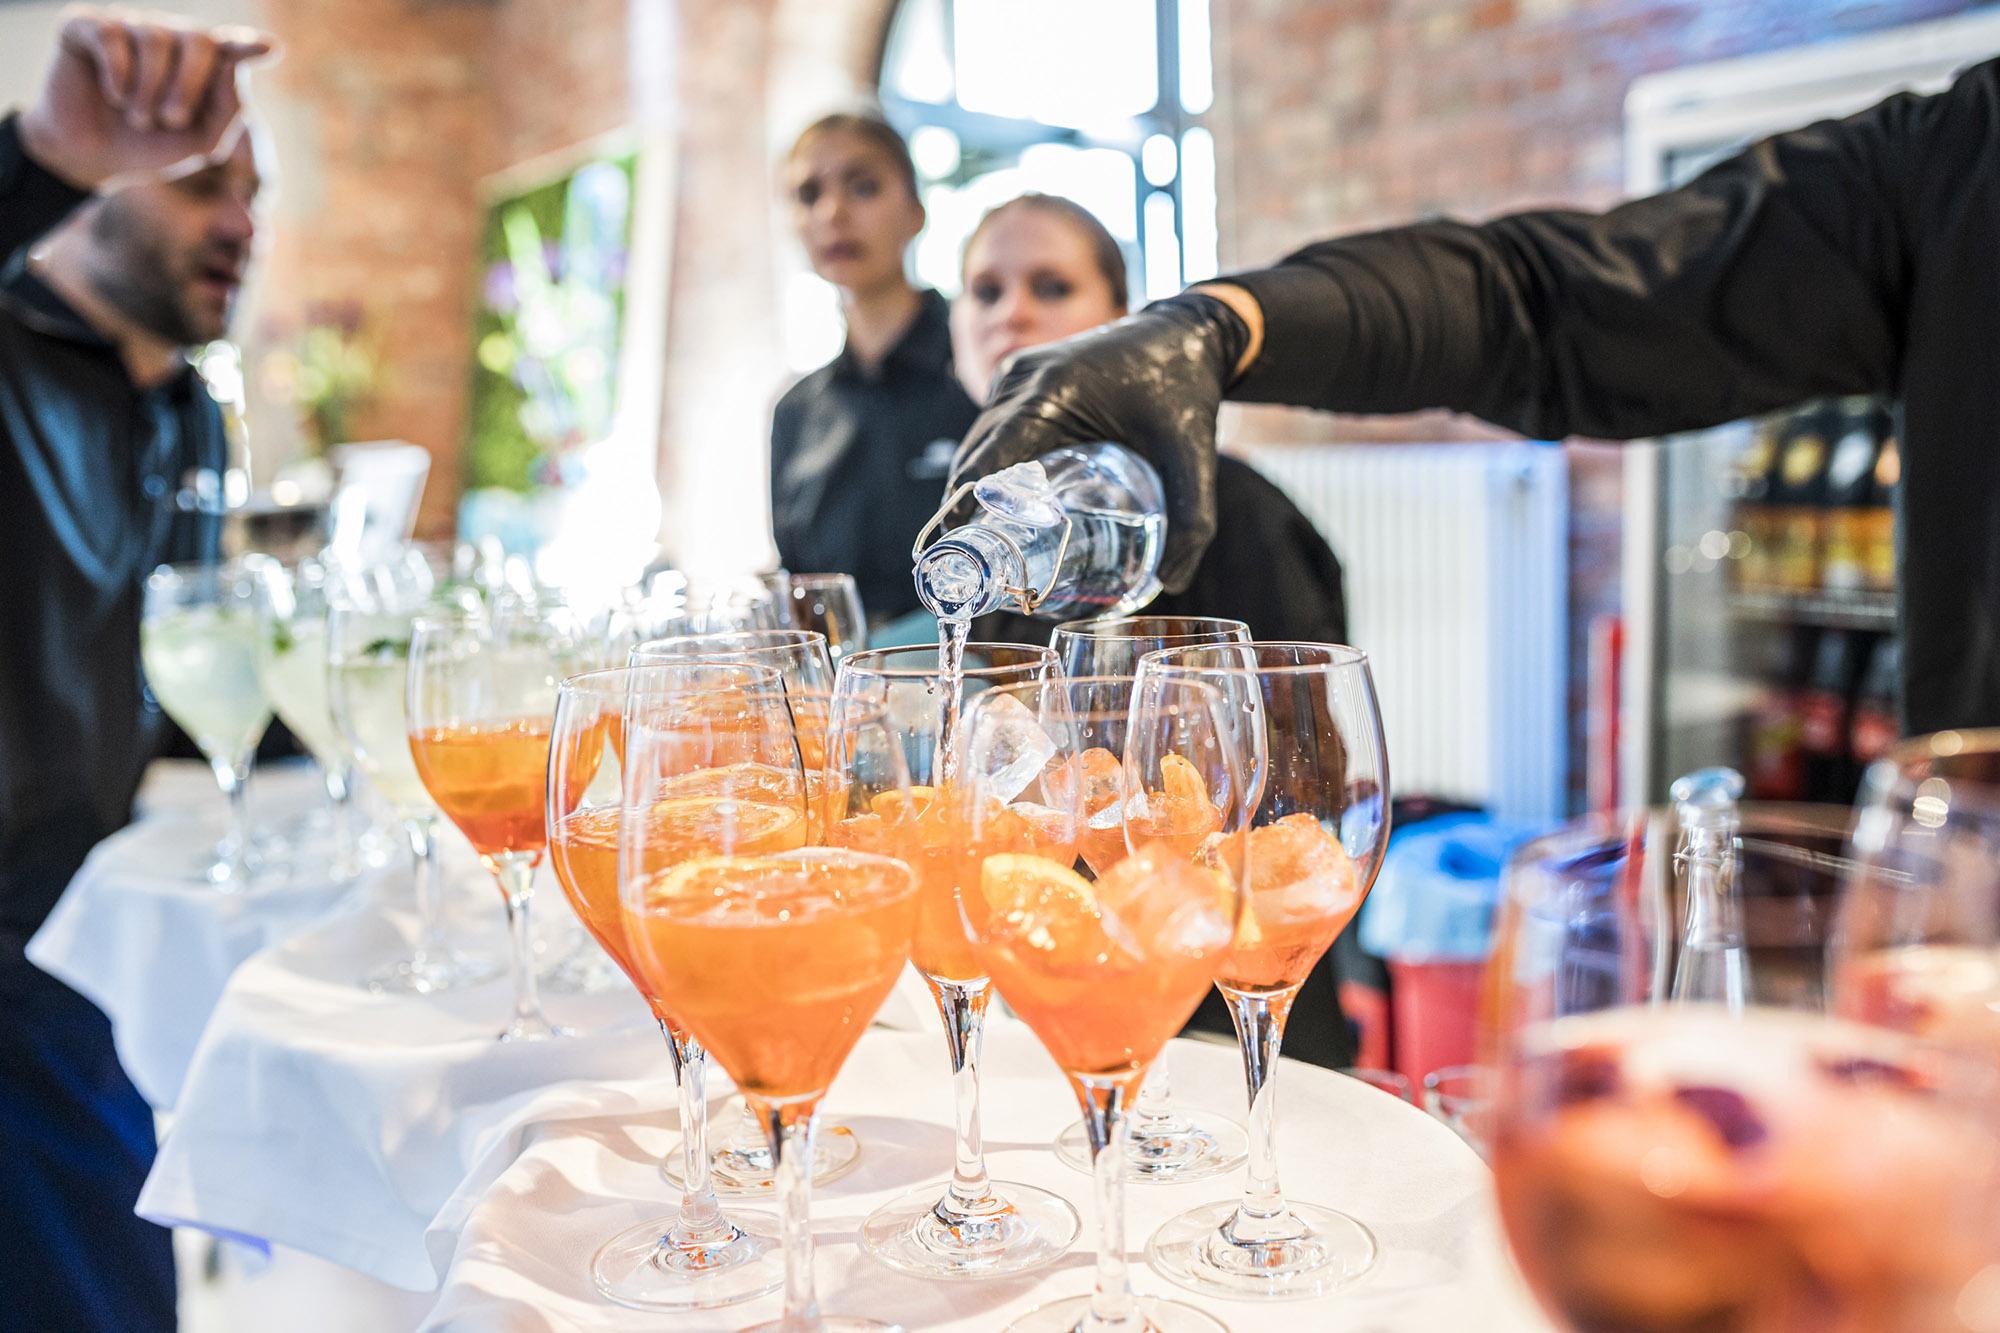 Getränkepauschale<br>Aperitif <span title='Alkoholfreie Getränke, Heißgetränke, Bier, Sekt, Wein, Aperitif' class='tippy'></span>